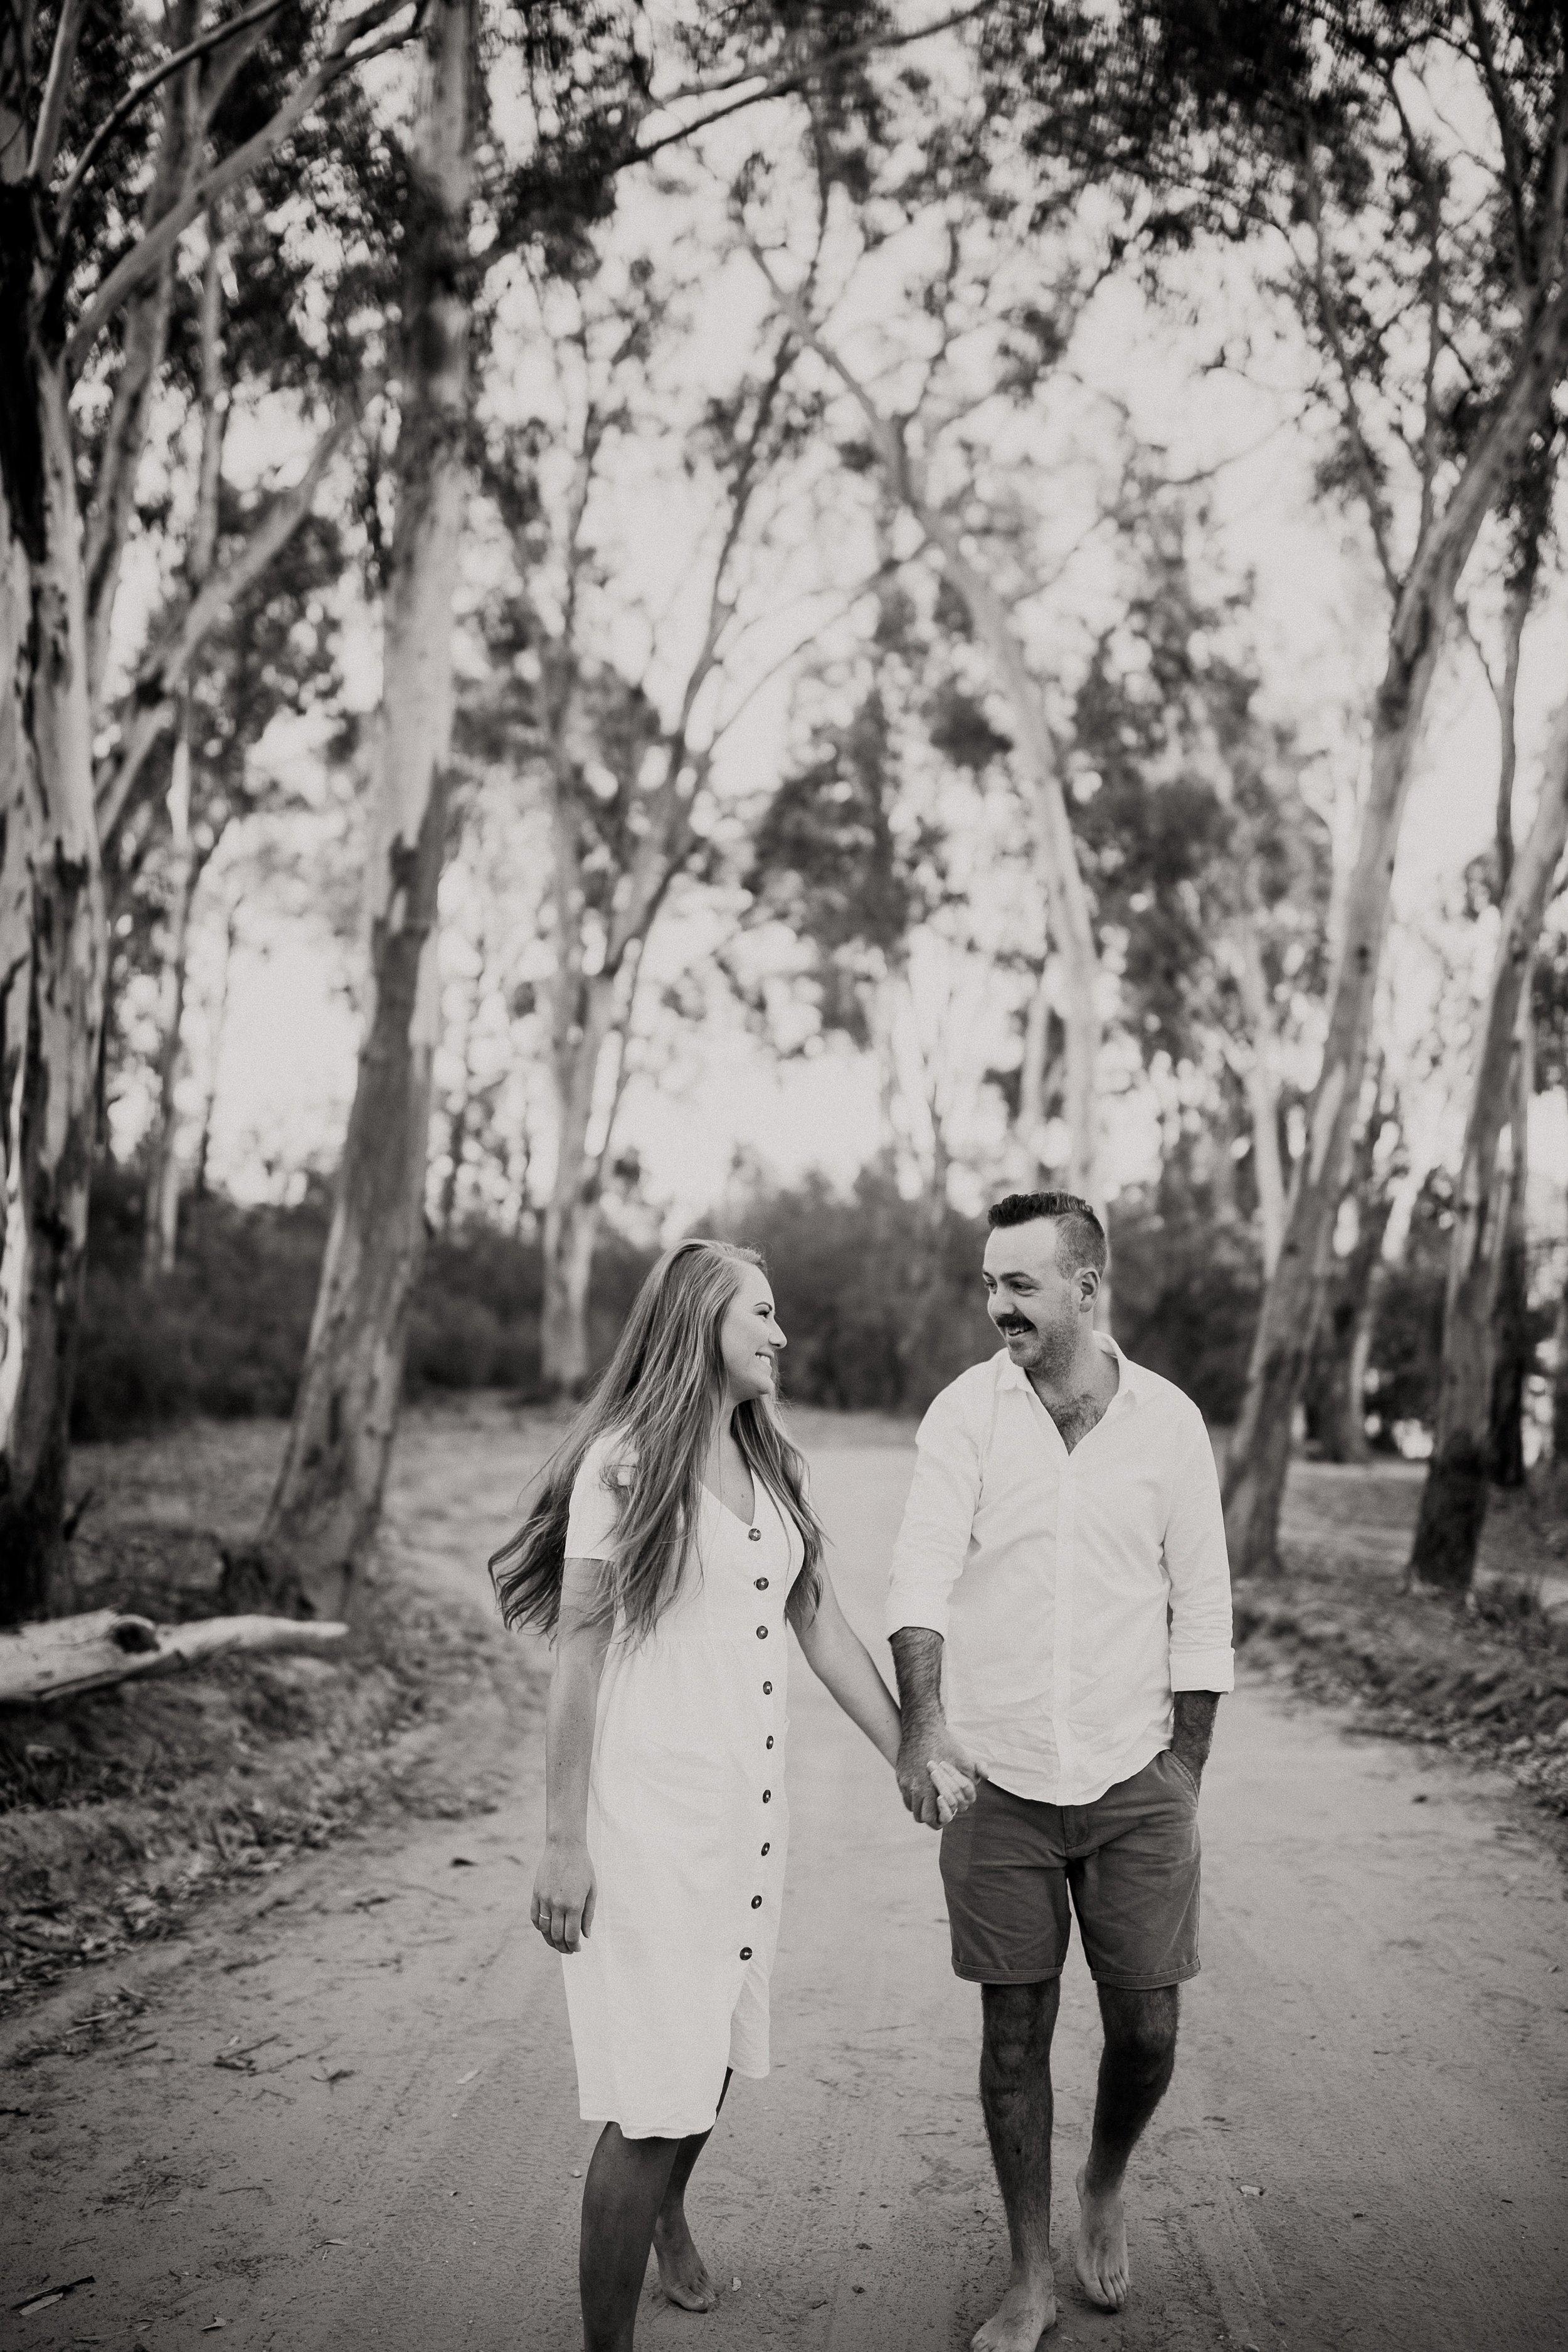 mickalathomas_puremacphotography_weddingphotographer_couplephotographer_Sheppartonphotographer_2816.jpg